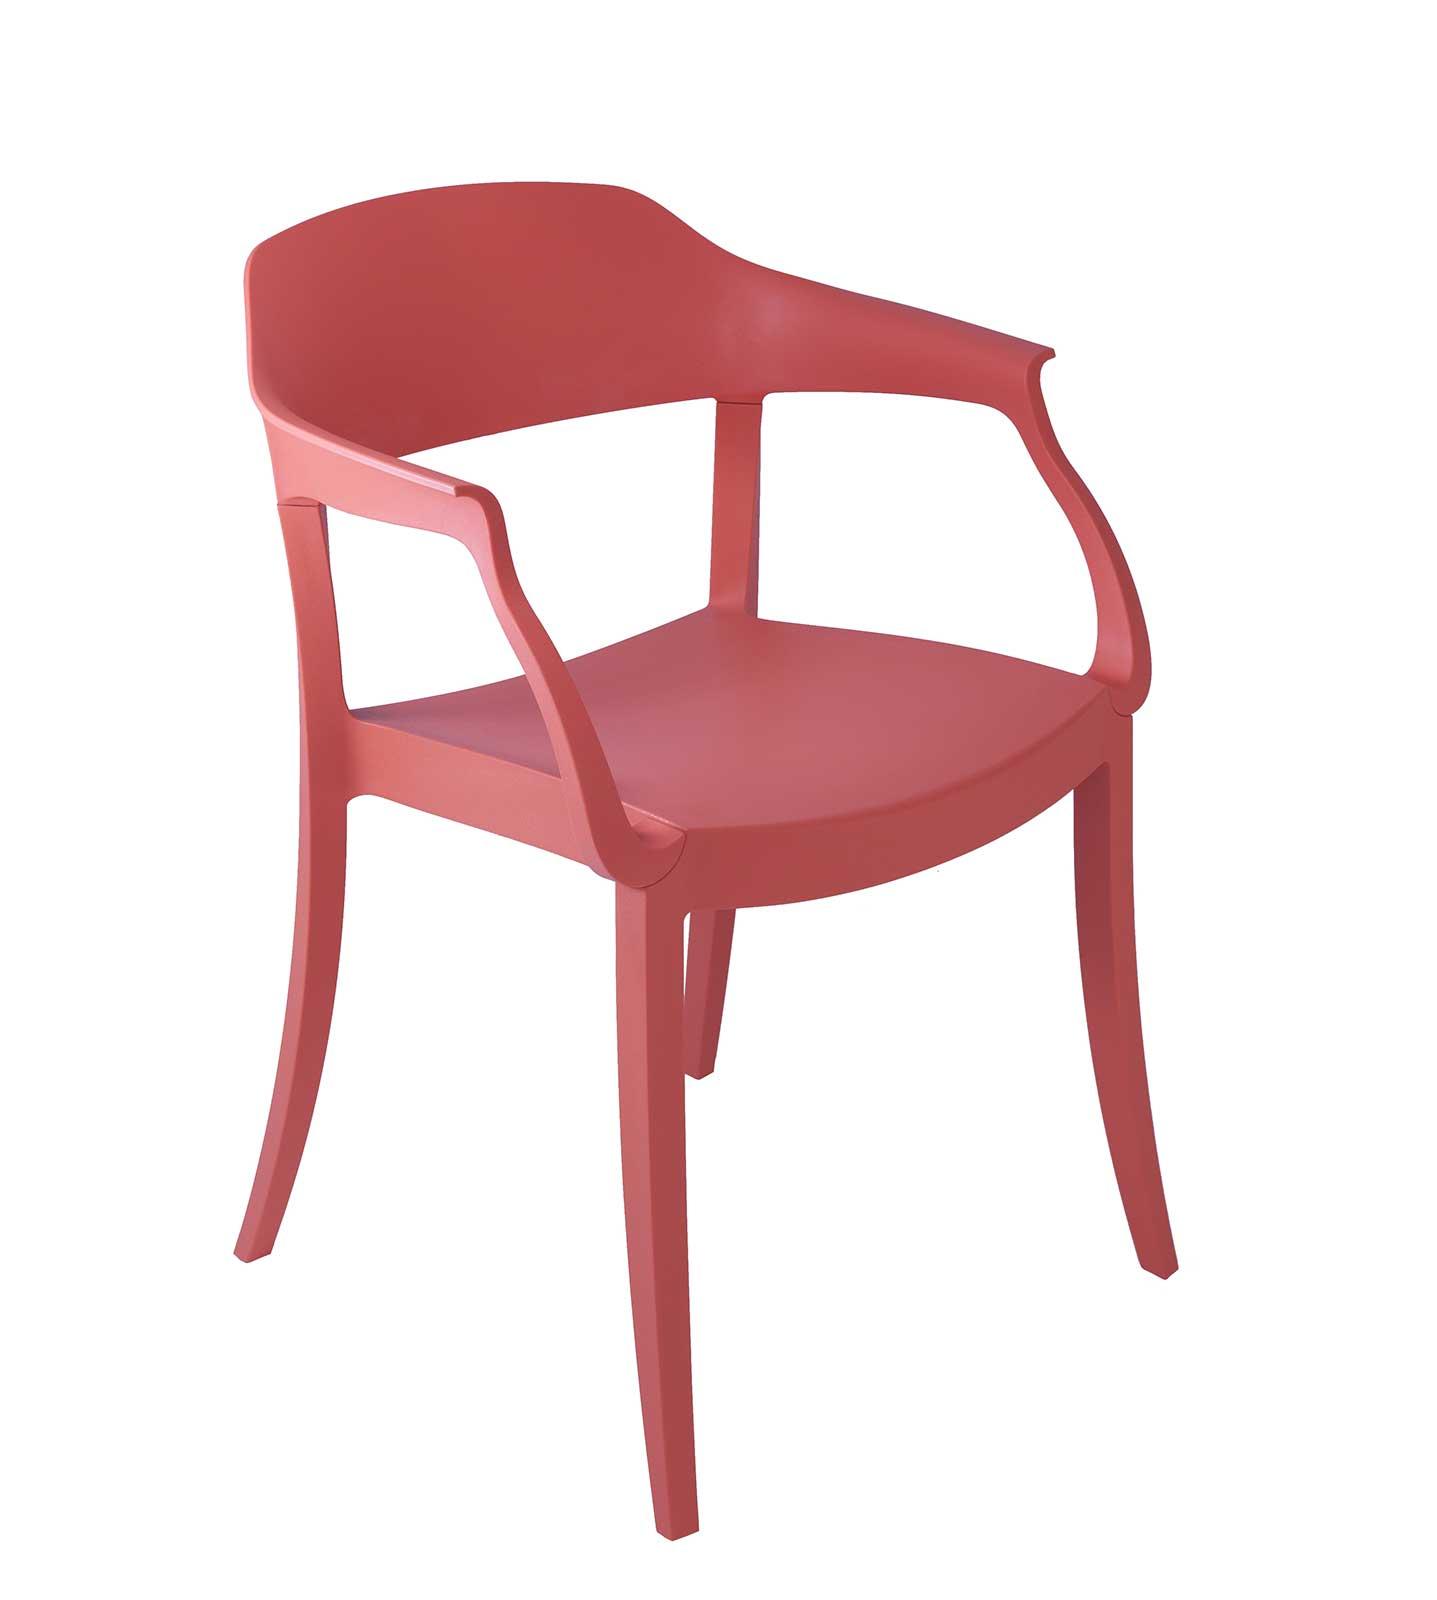 Chaise Design Rouge Salle A Manger | Chaise Salle A Manger Noir ...